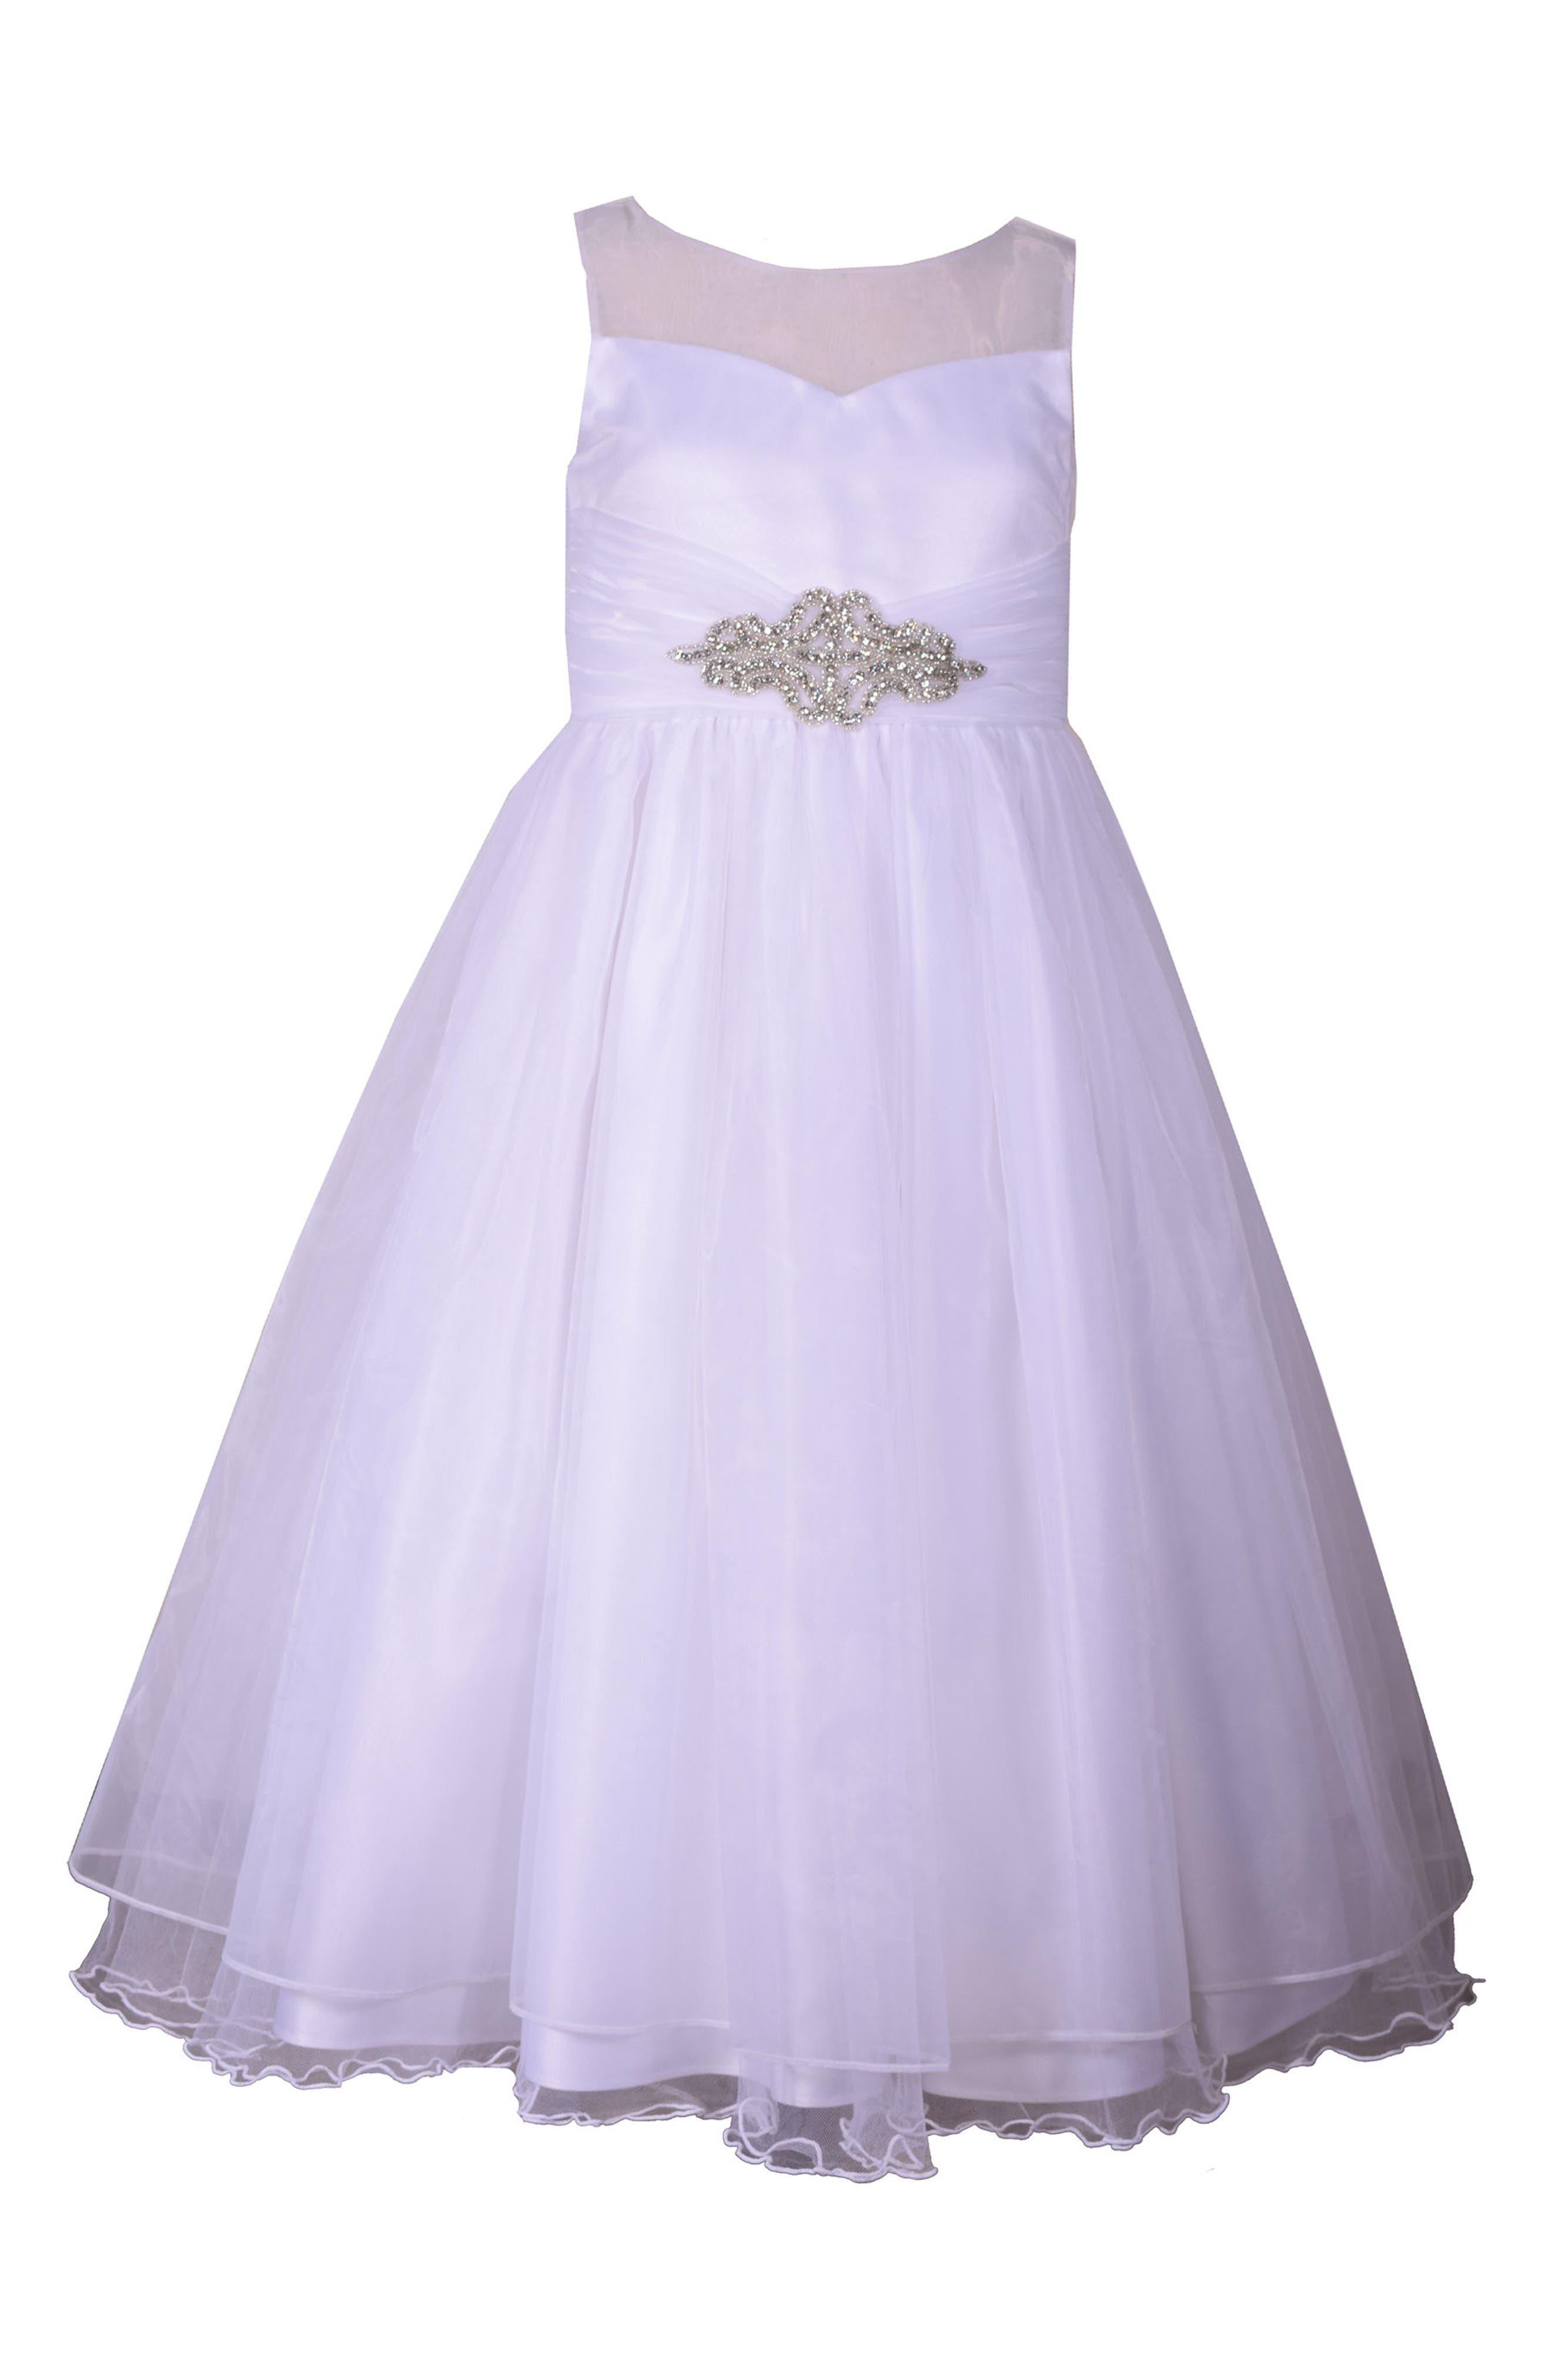 Embellished First Communion Dress,                         Main,                         color, 100